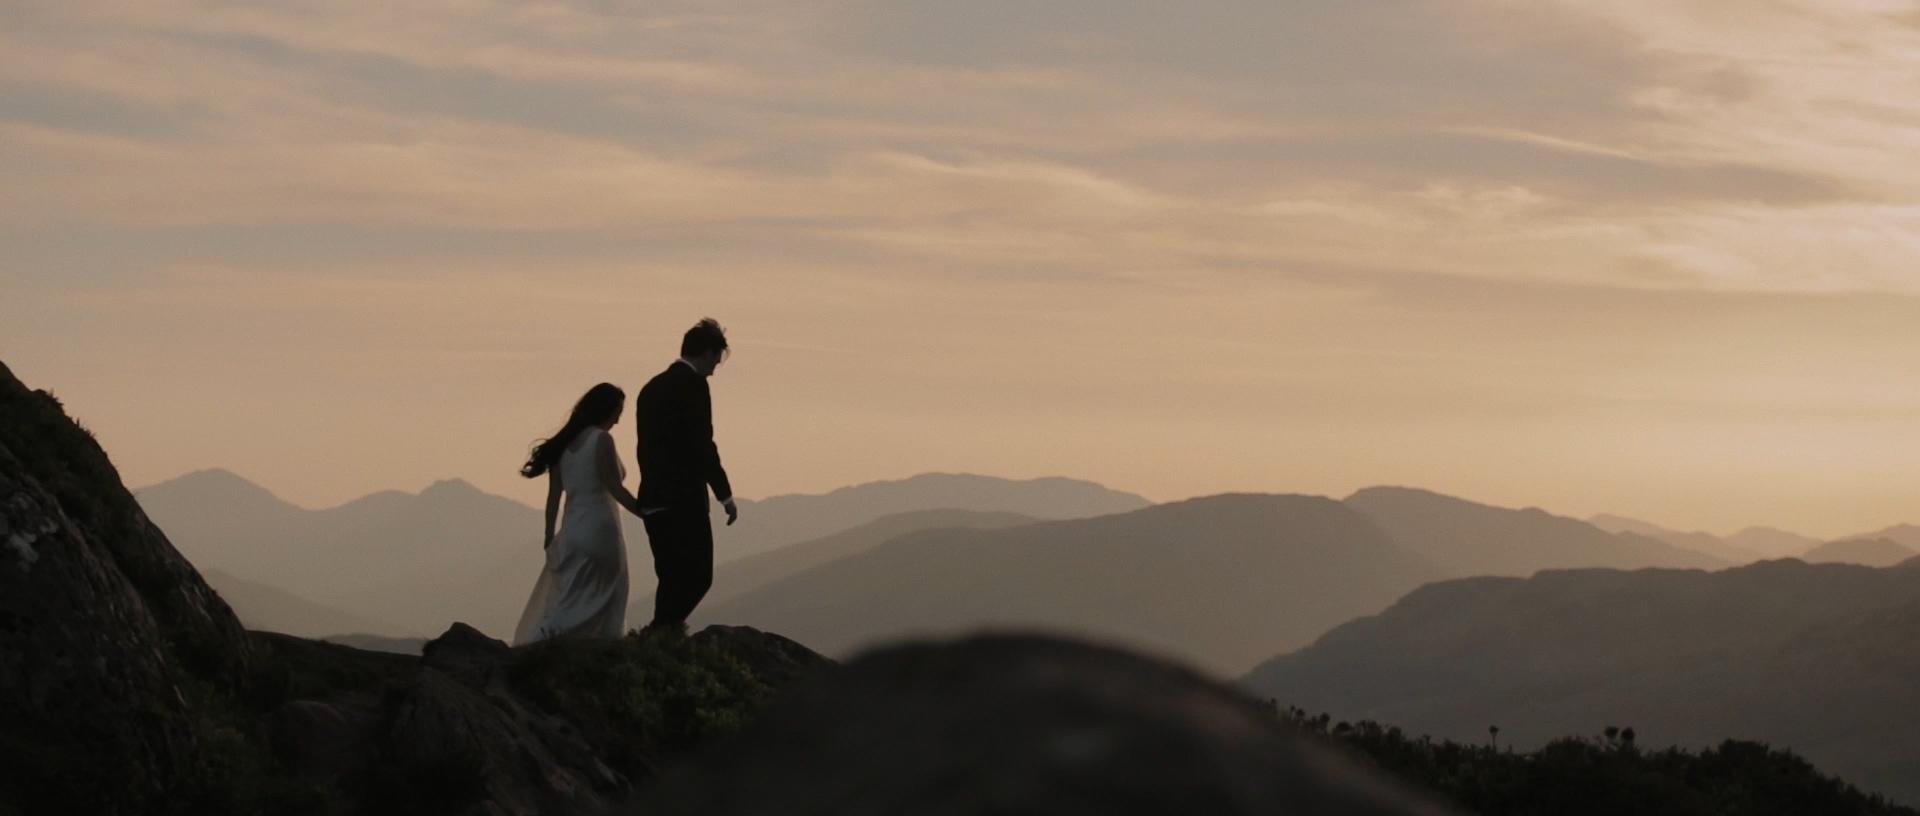 the-byre-at-inchyra-wedding-videographer_LL_01.jpg